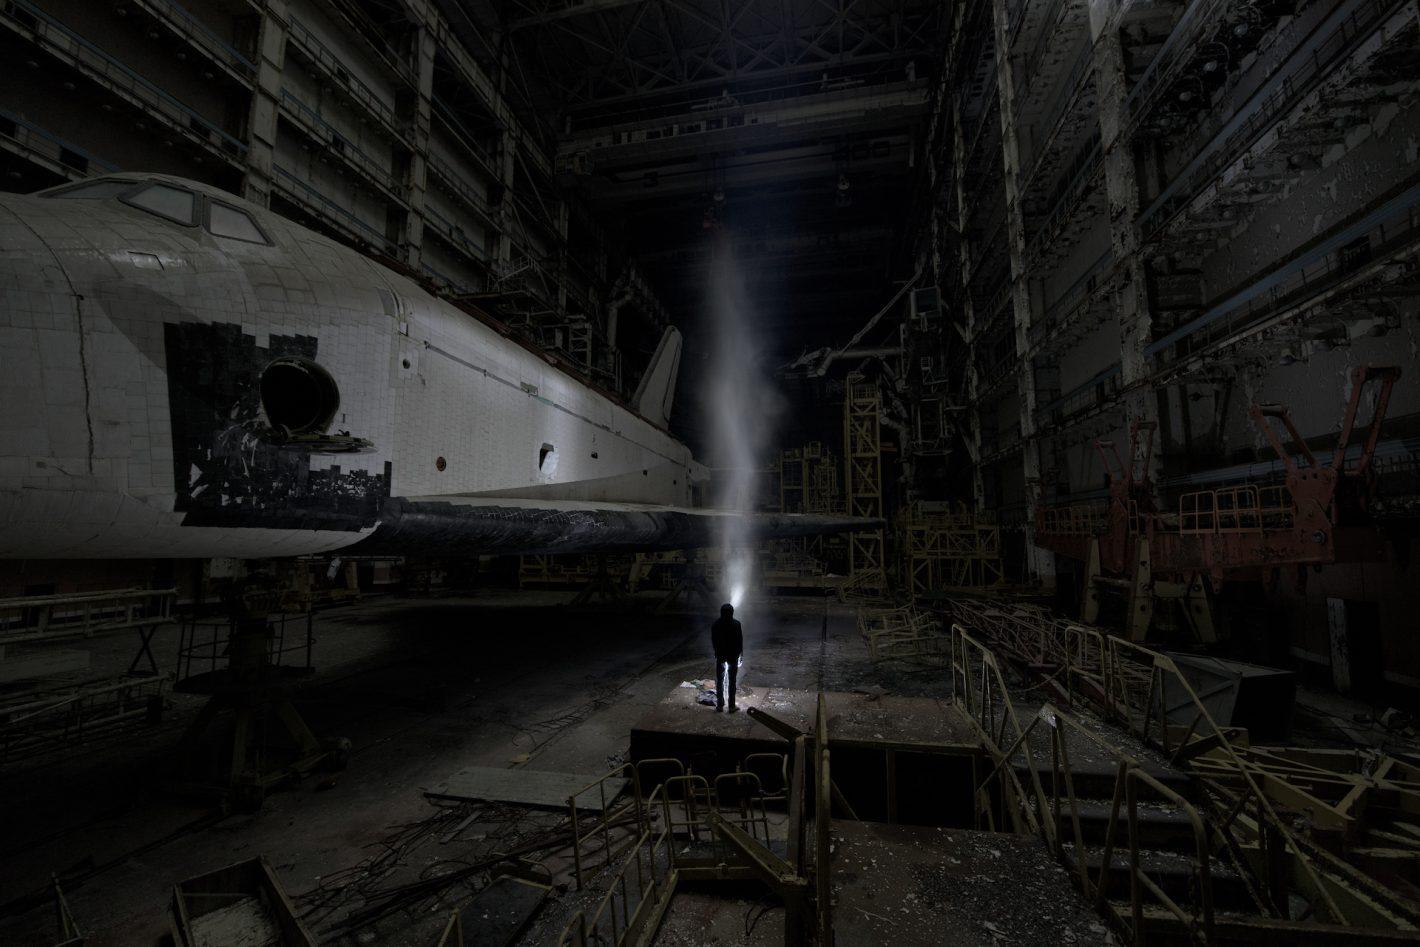 Les lieux abandonnés remplis d'histoires / David de Rueda